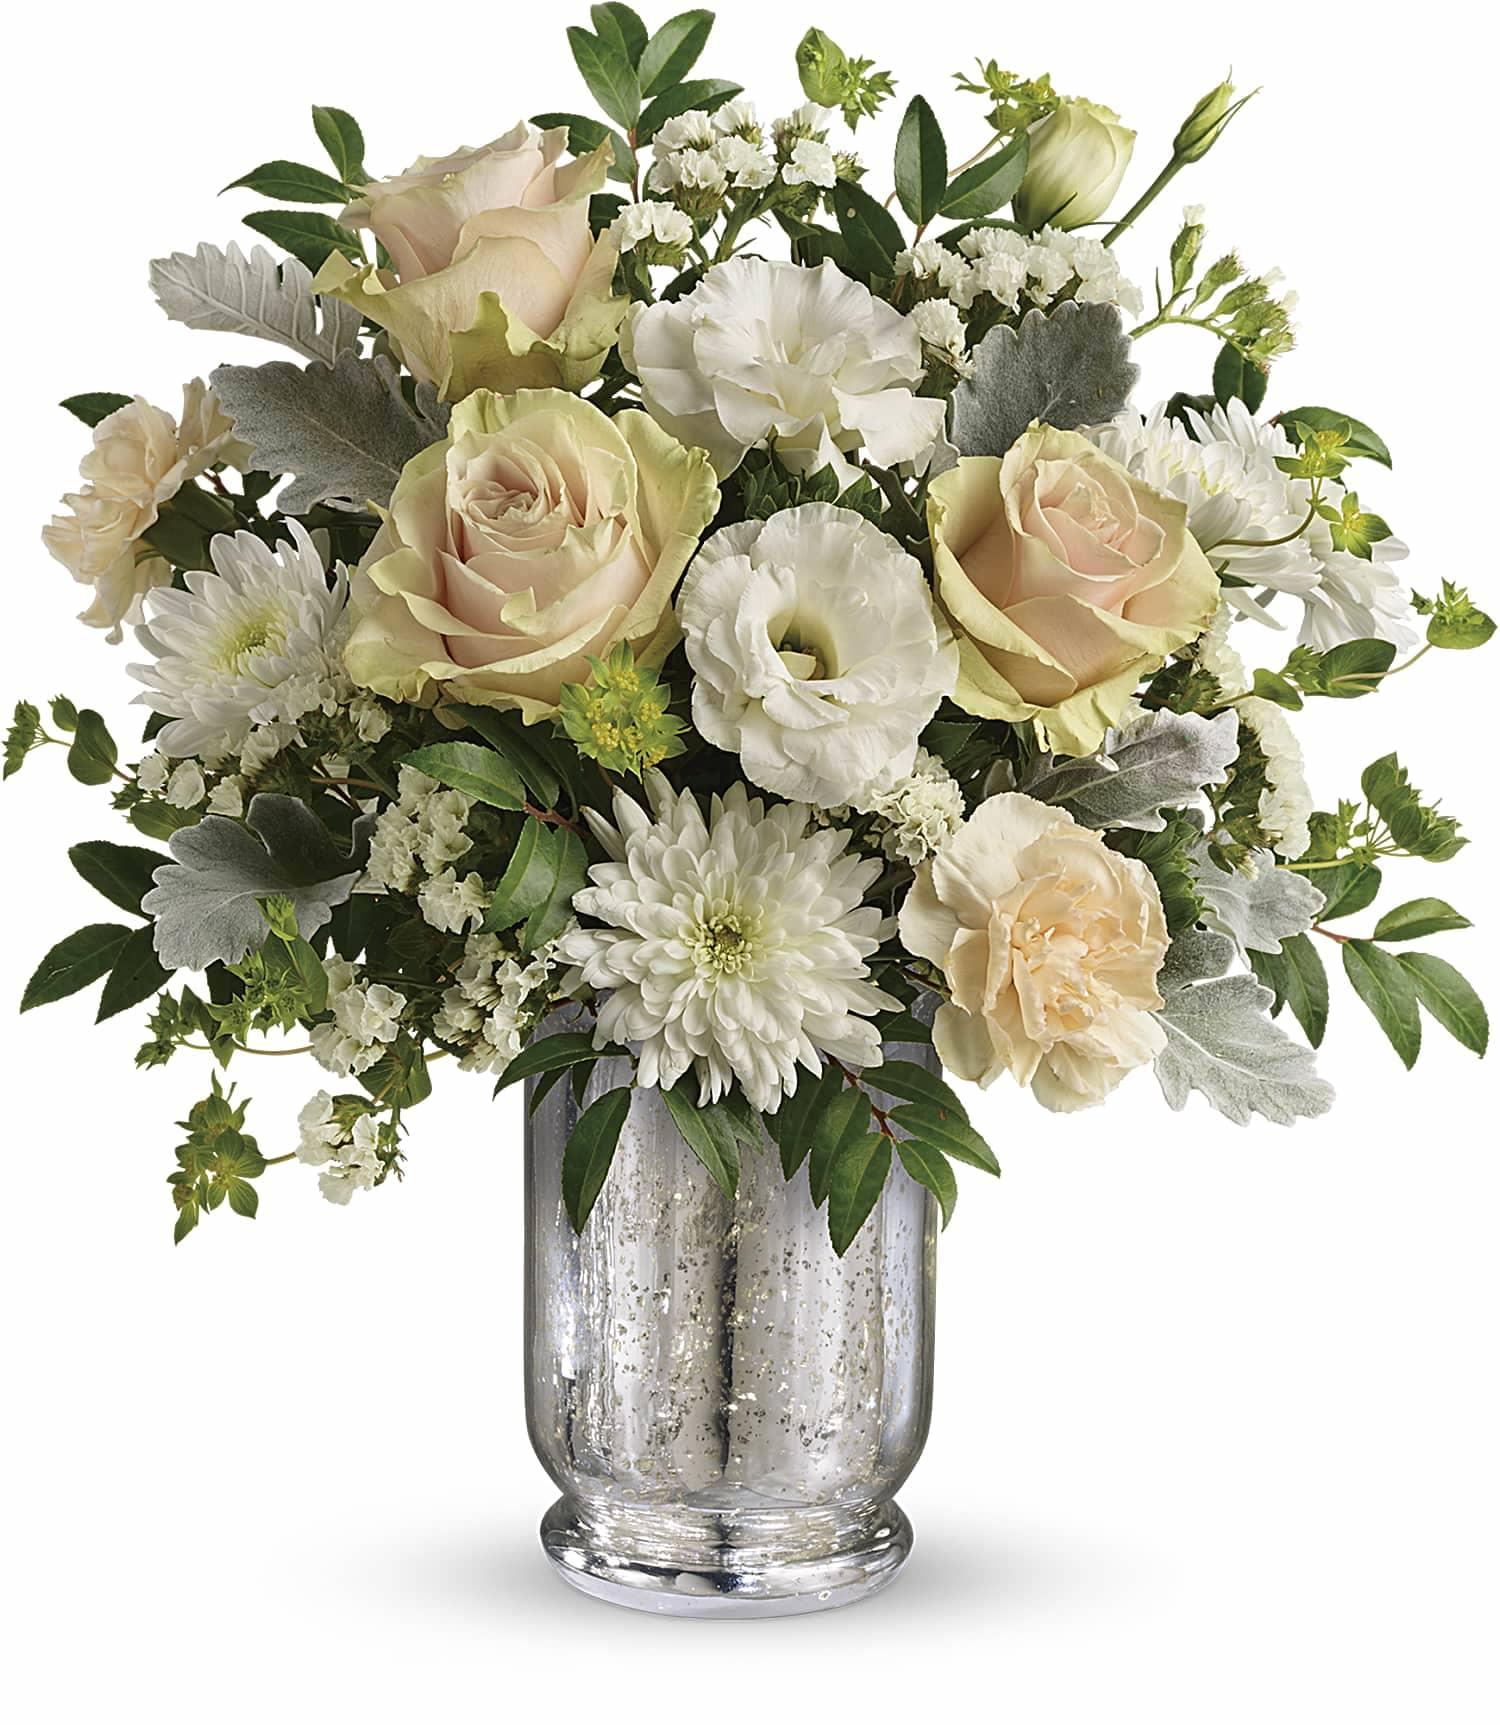 Endless Lovelies Bouquet in Metuchen, NJ